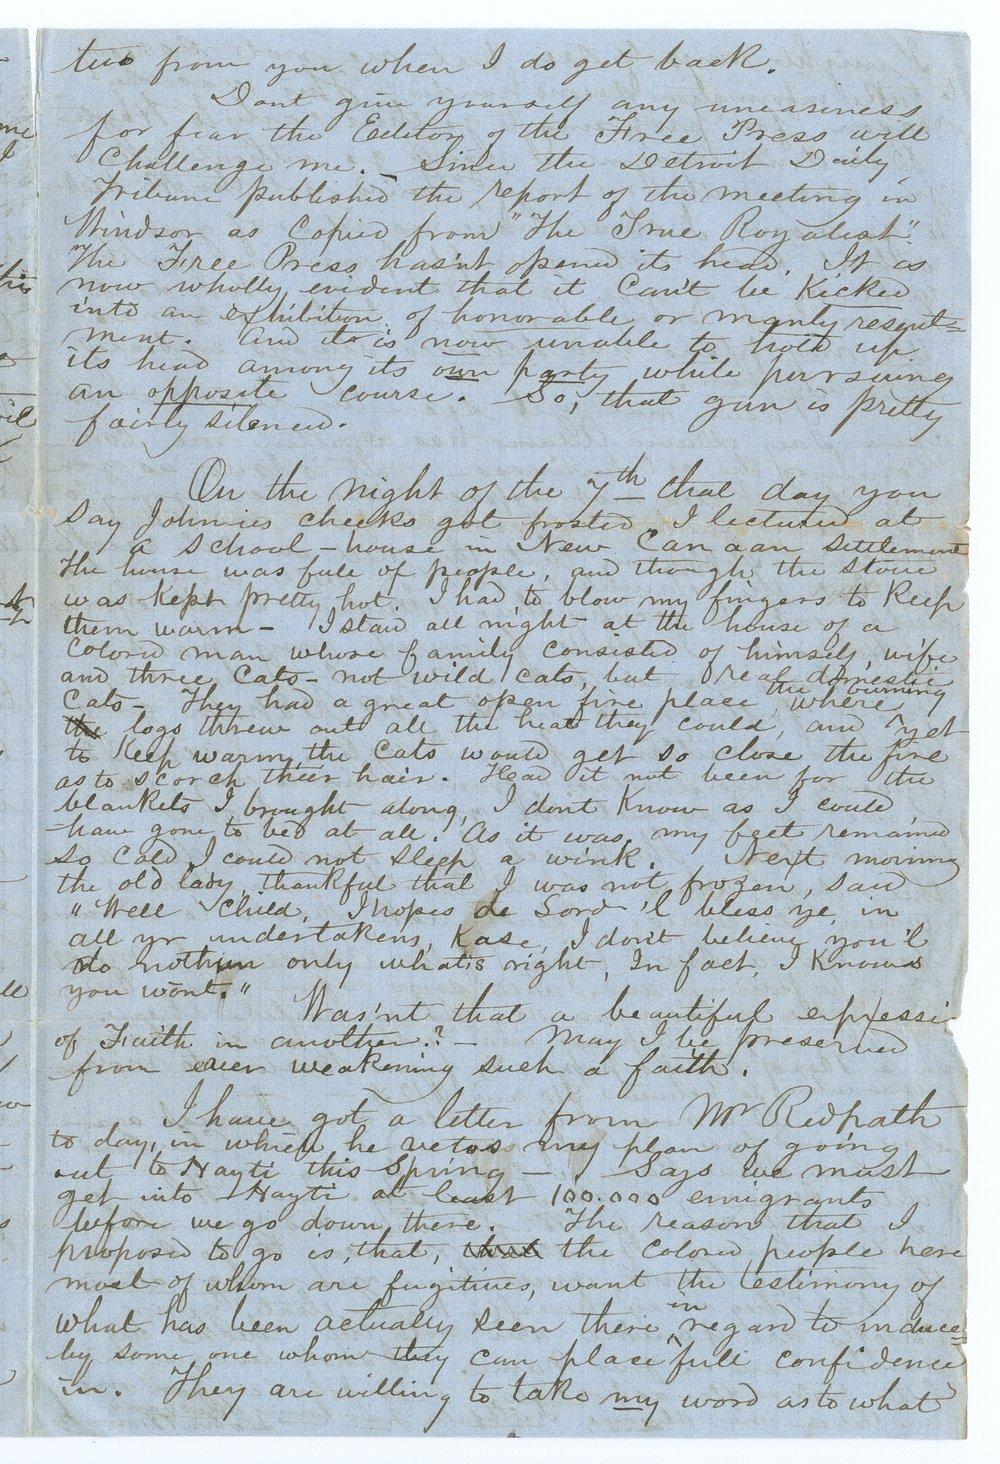 John Brown, Jr. correspondence - 3